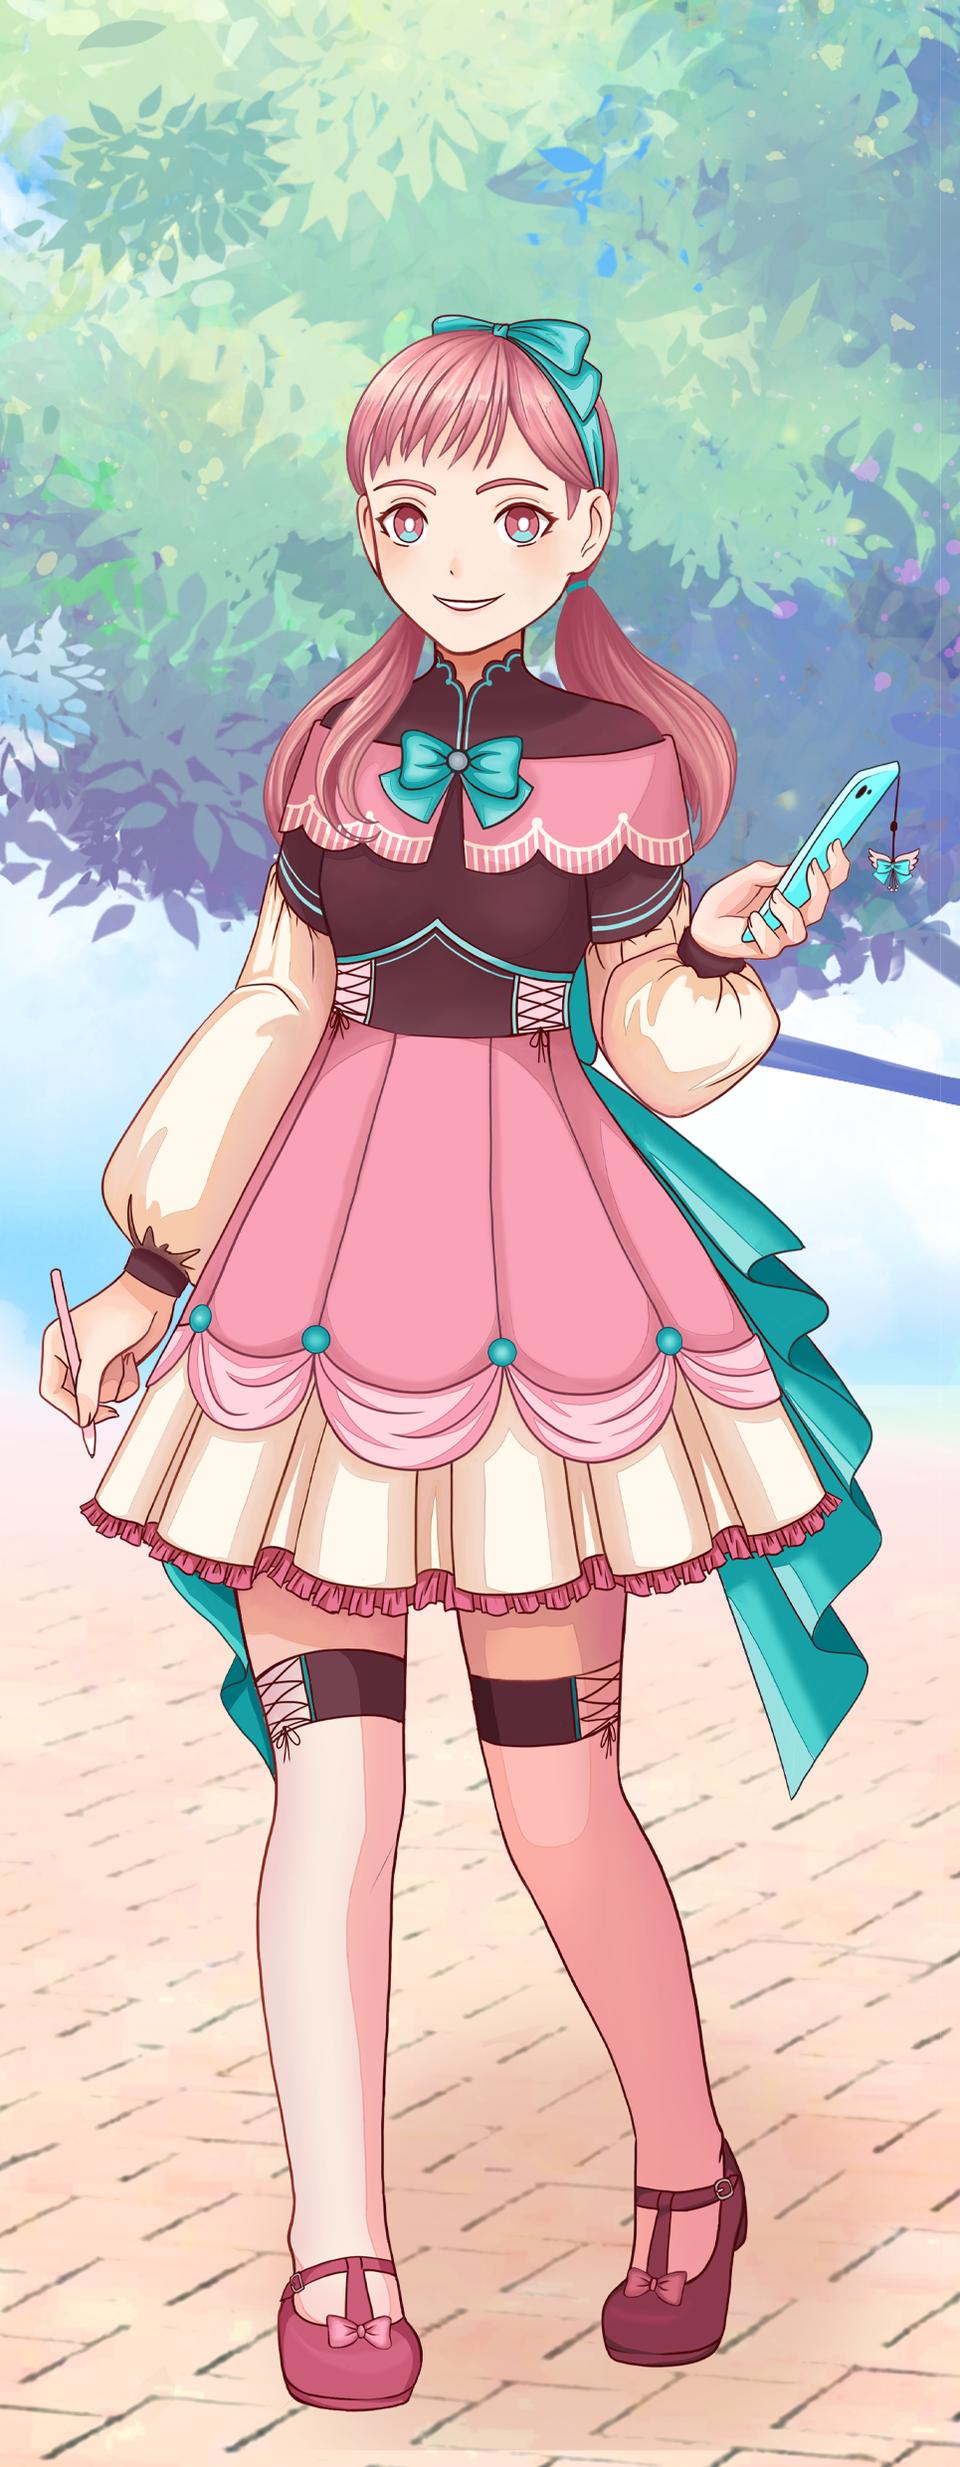 Pastel Sketch Pink Character Illust of Shurmmi & Izni PASTEL_SKETCH2020 pastel